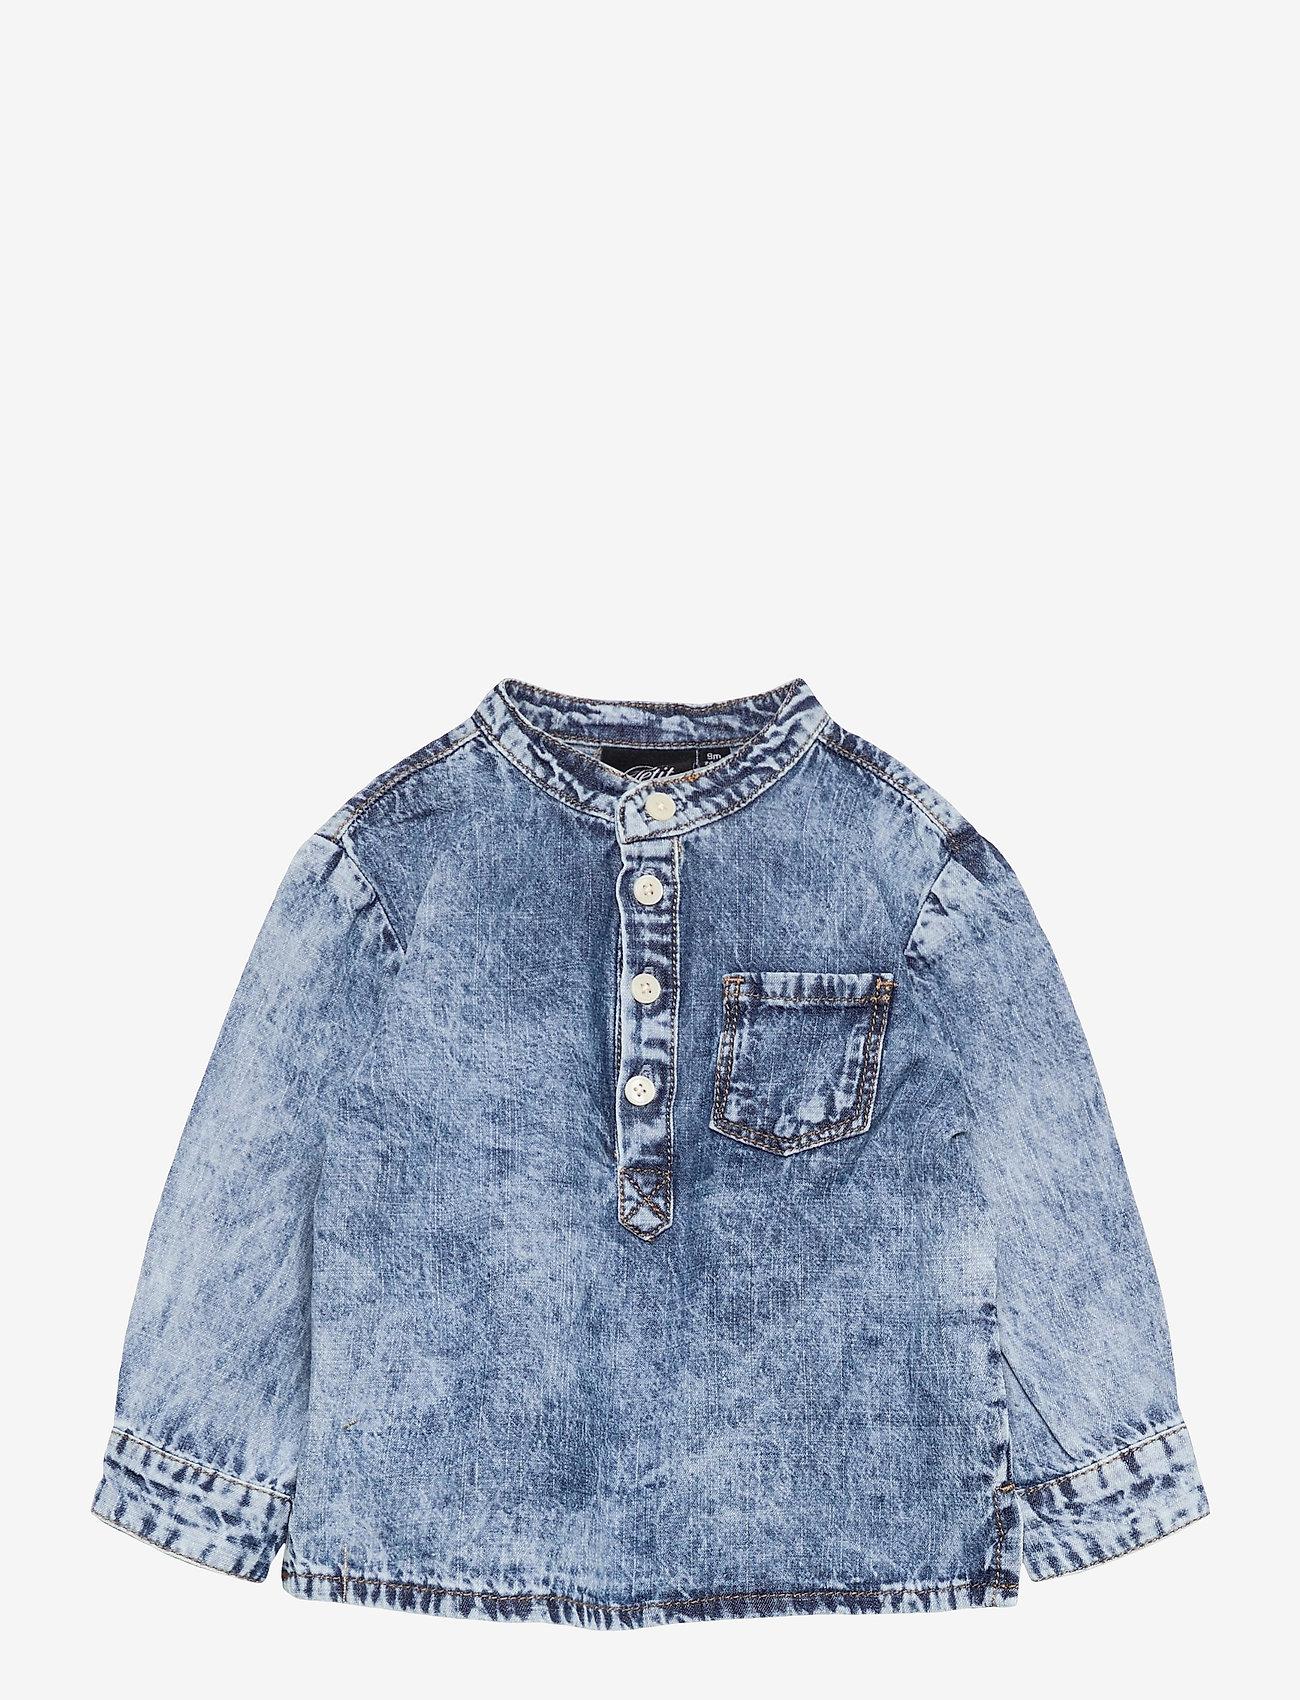 Petit by Sofie Schnoor - Shirt - shirts - blue - 0